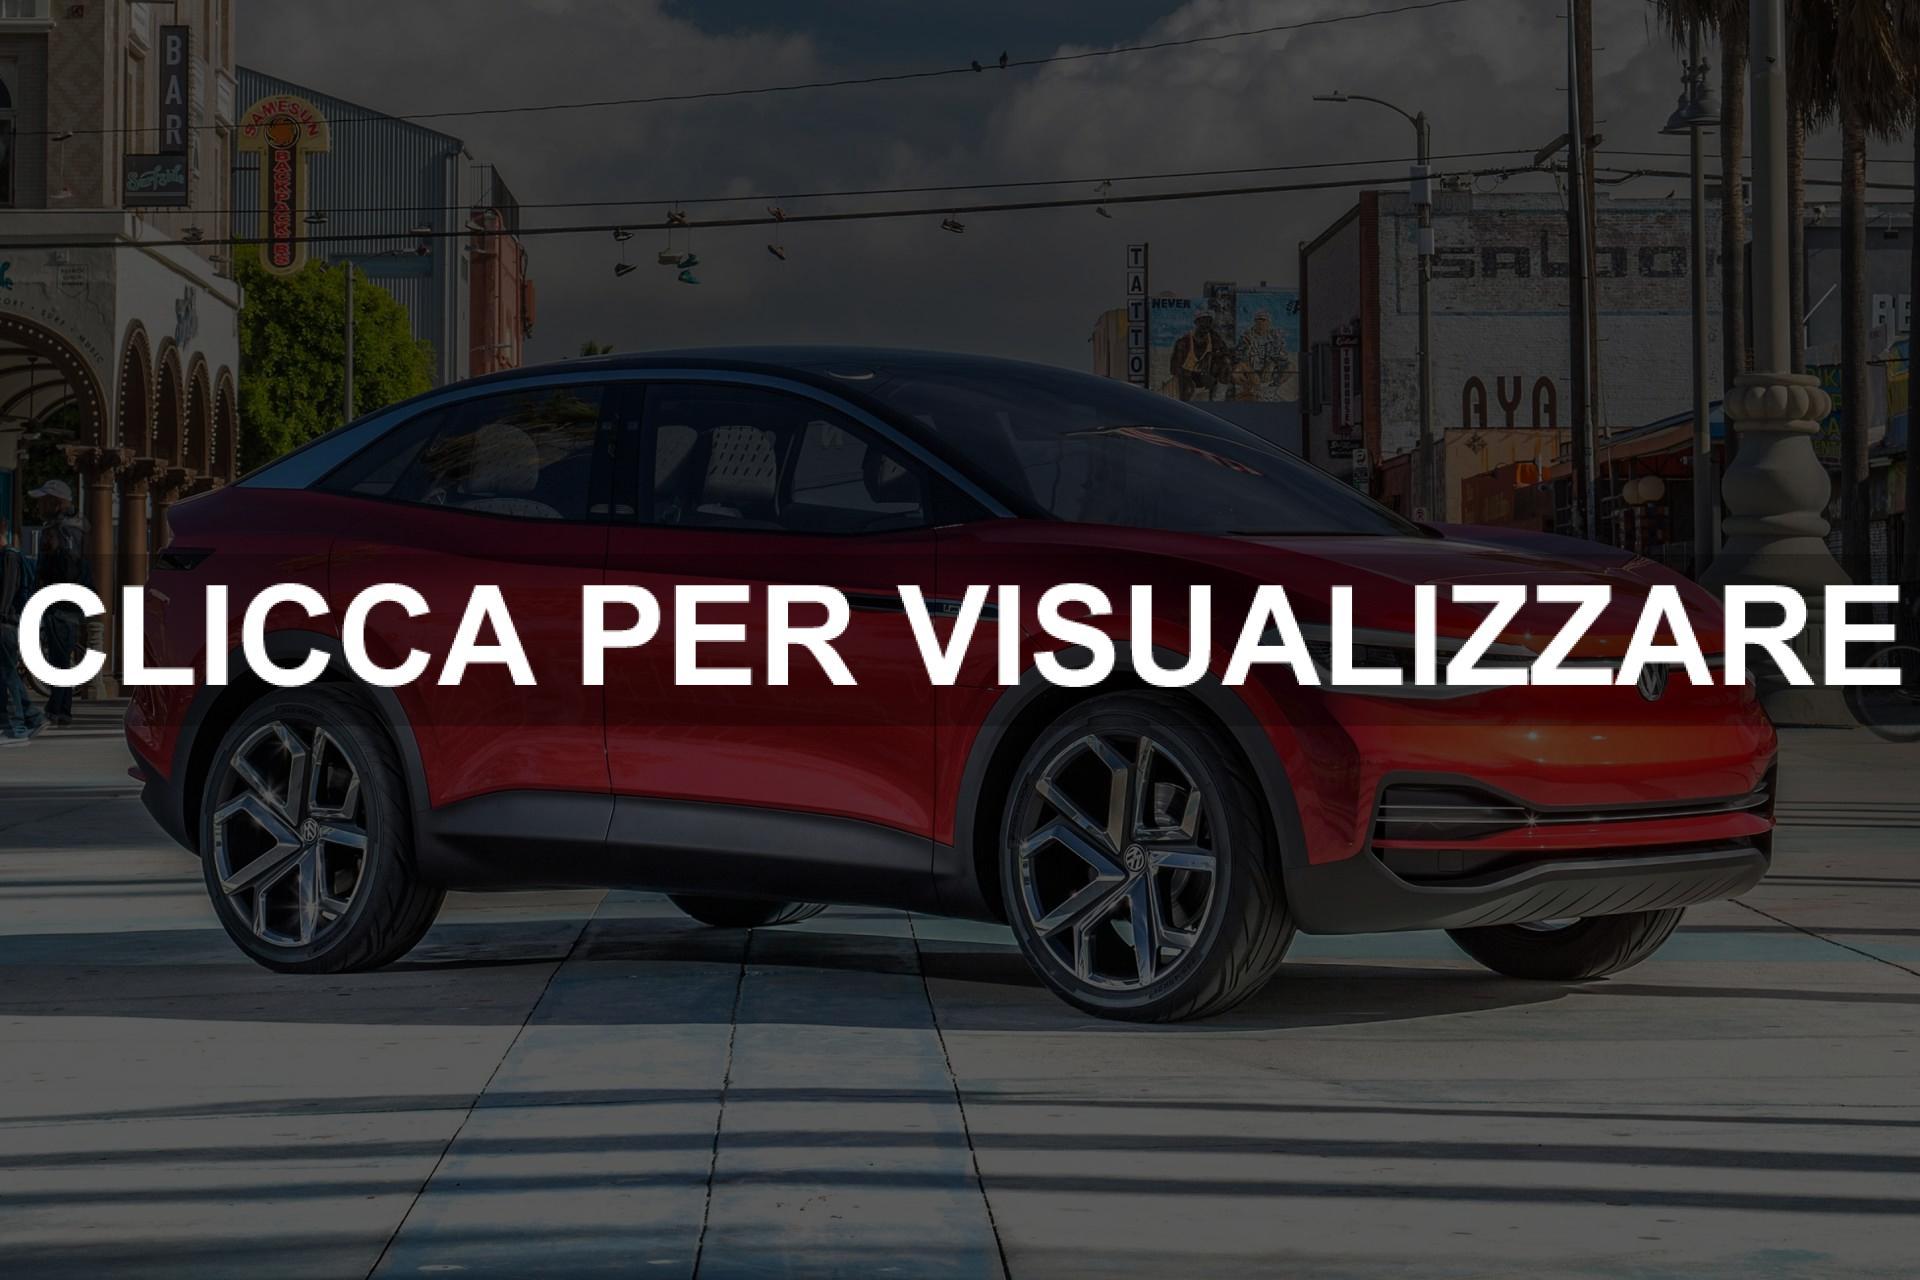 Nuovo Volkswagen crossover elettrico ID Crozz Concept